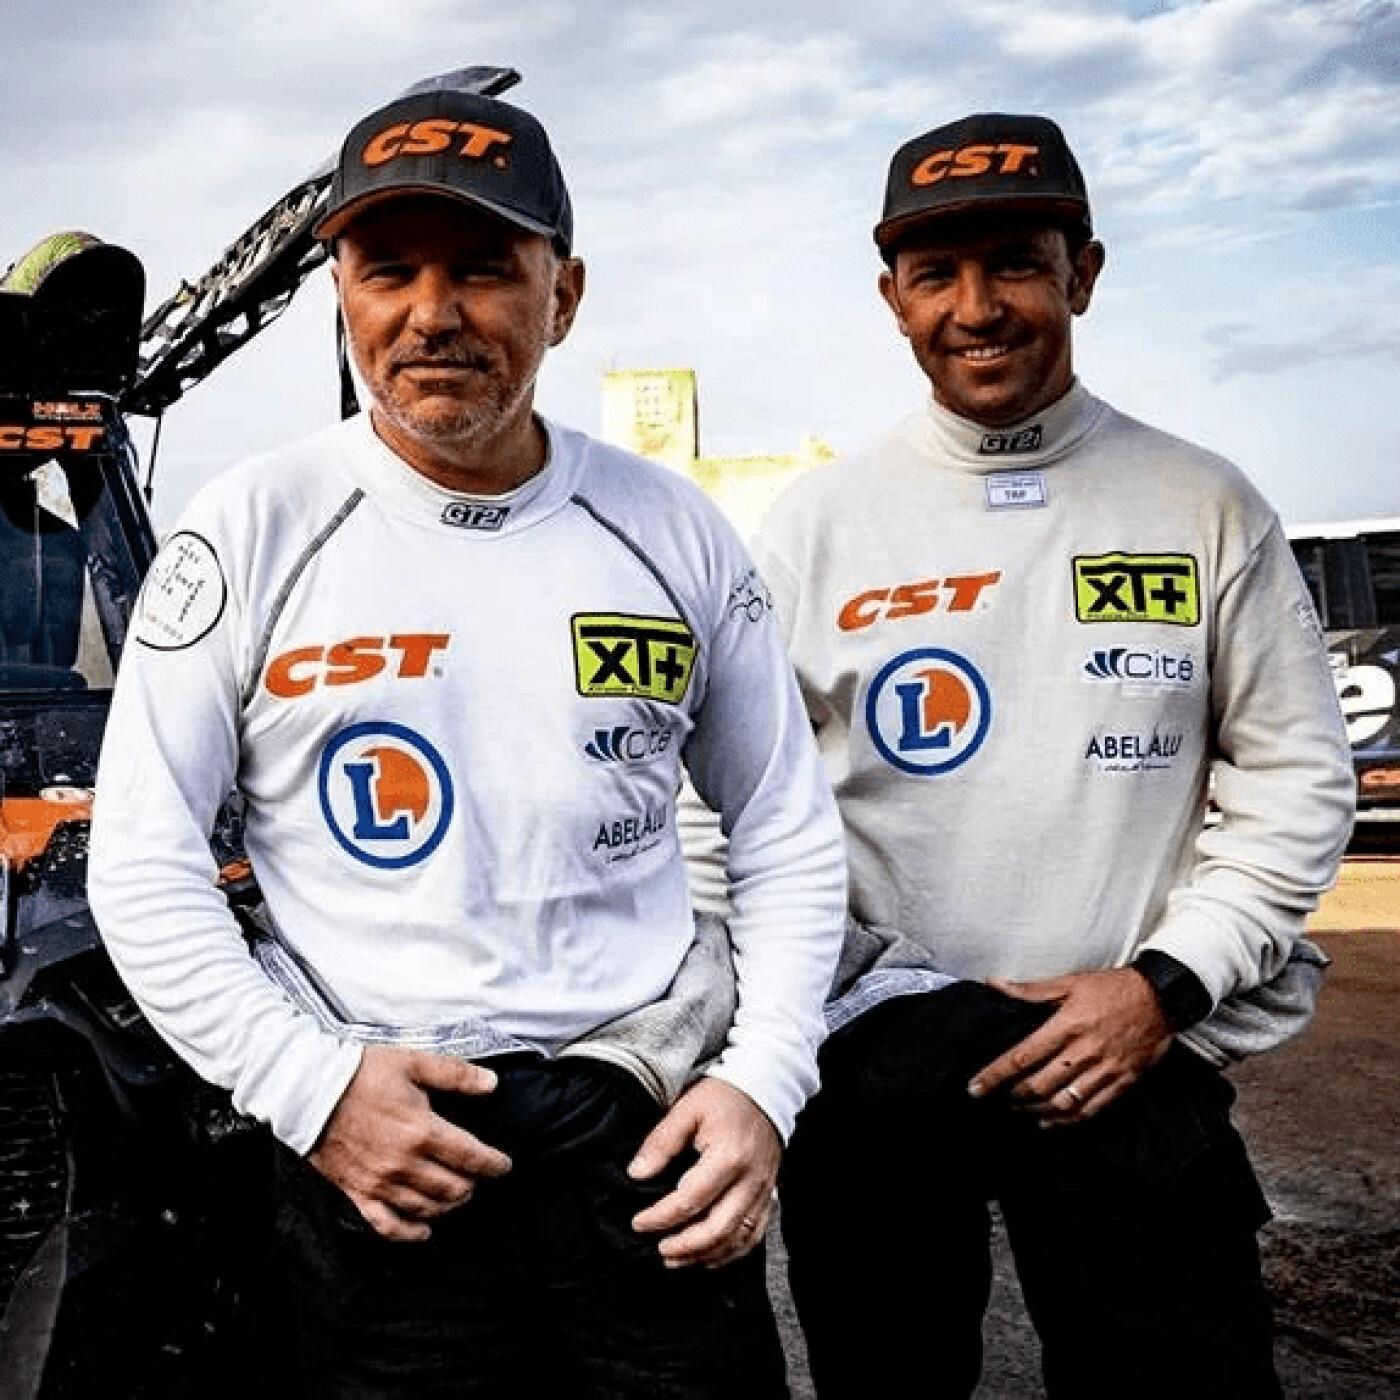 Minute Sport spécial rallye dakar avec Eric Abel et Christian Manez